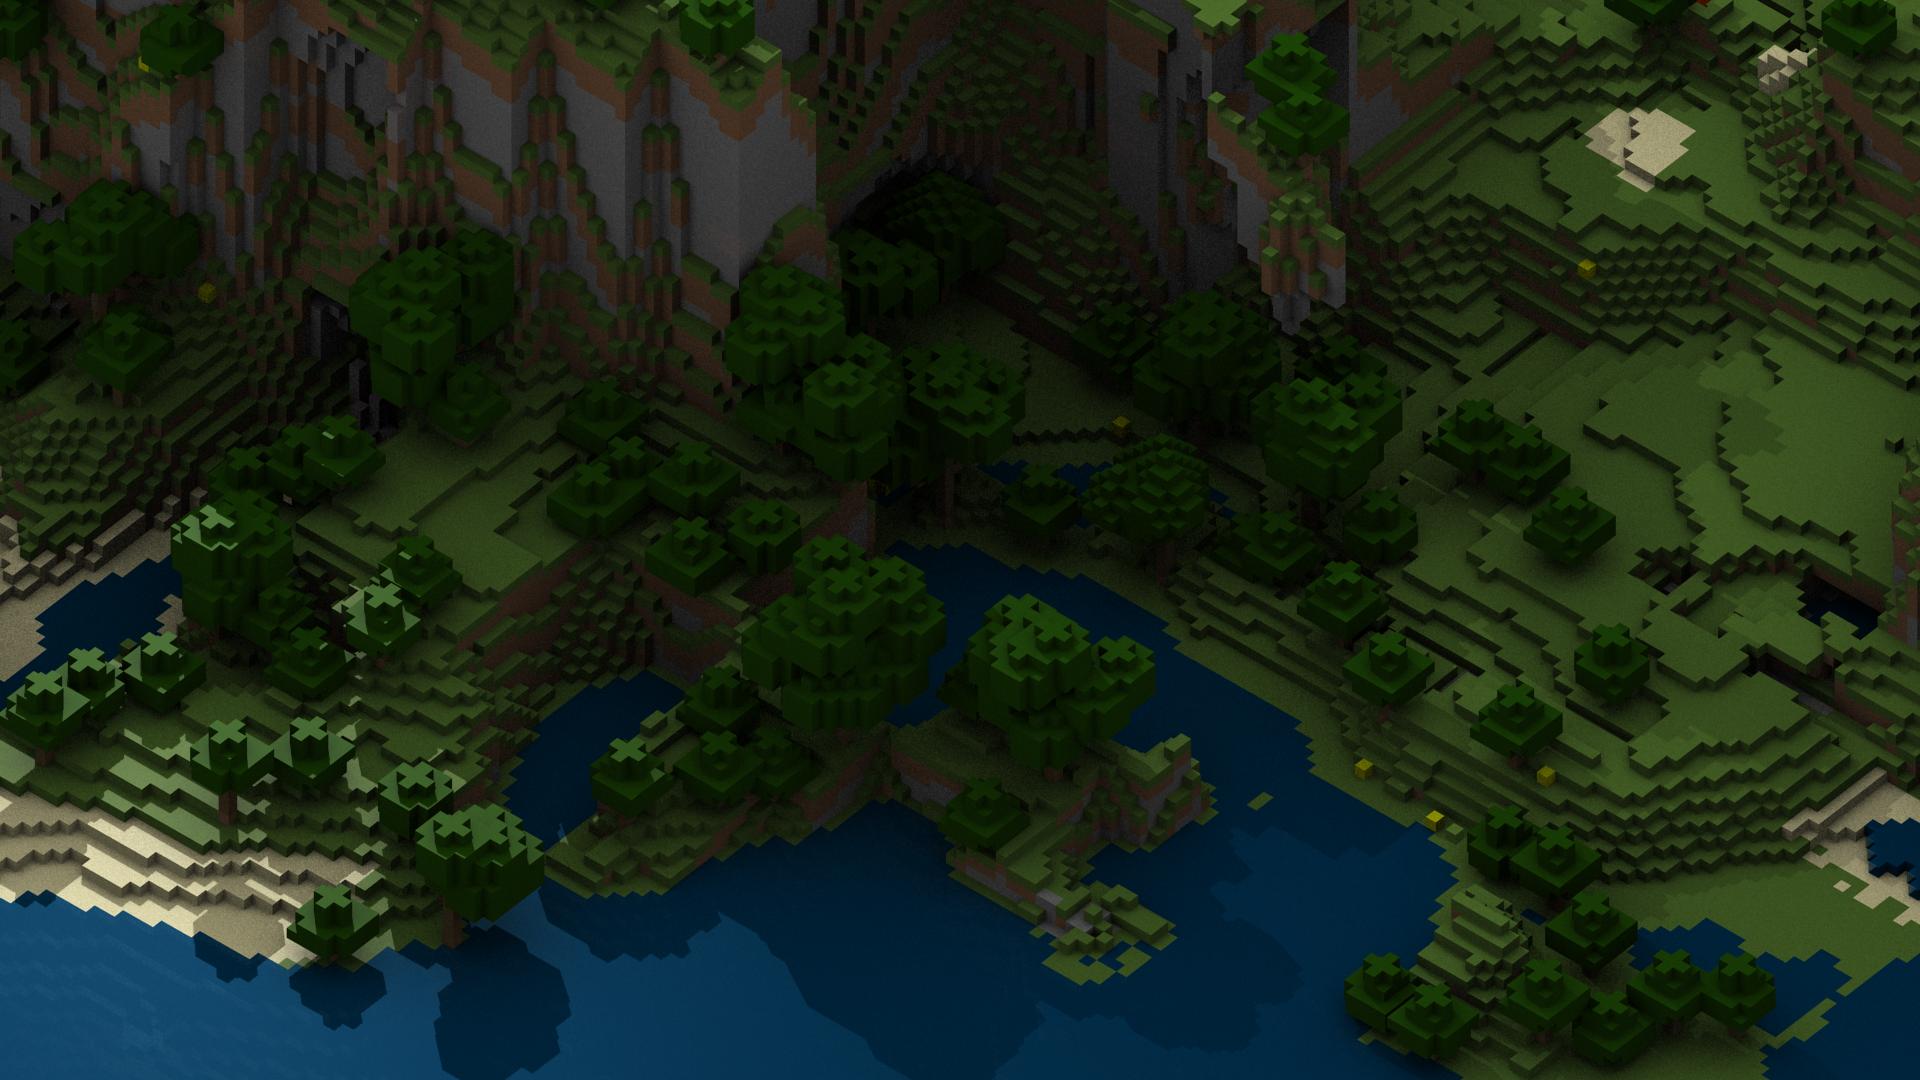 Simple Wallpaper Minecraft Forest - minecraft-wallpaper-hd-1920x1080  Snapshot_168498.png